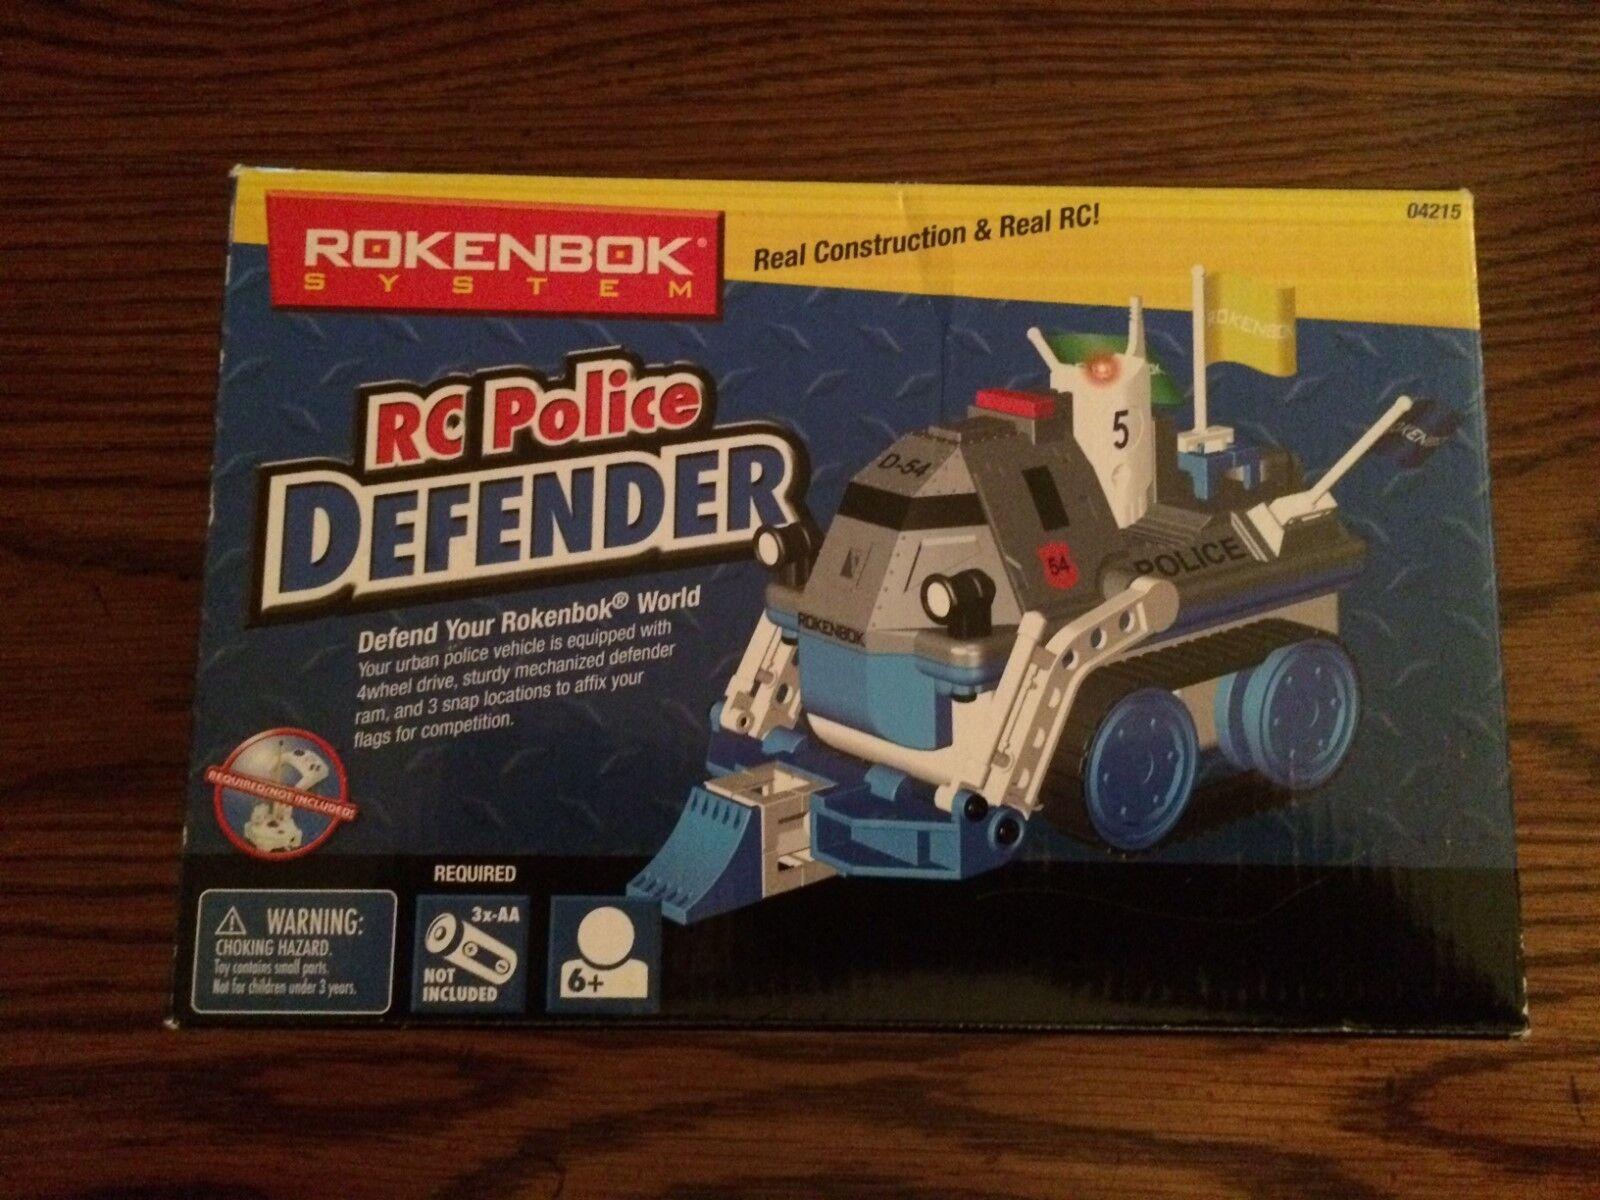 Rokenbok 04215 RC Police Defender for the Original Rokenbok Building System New